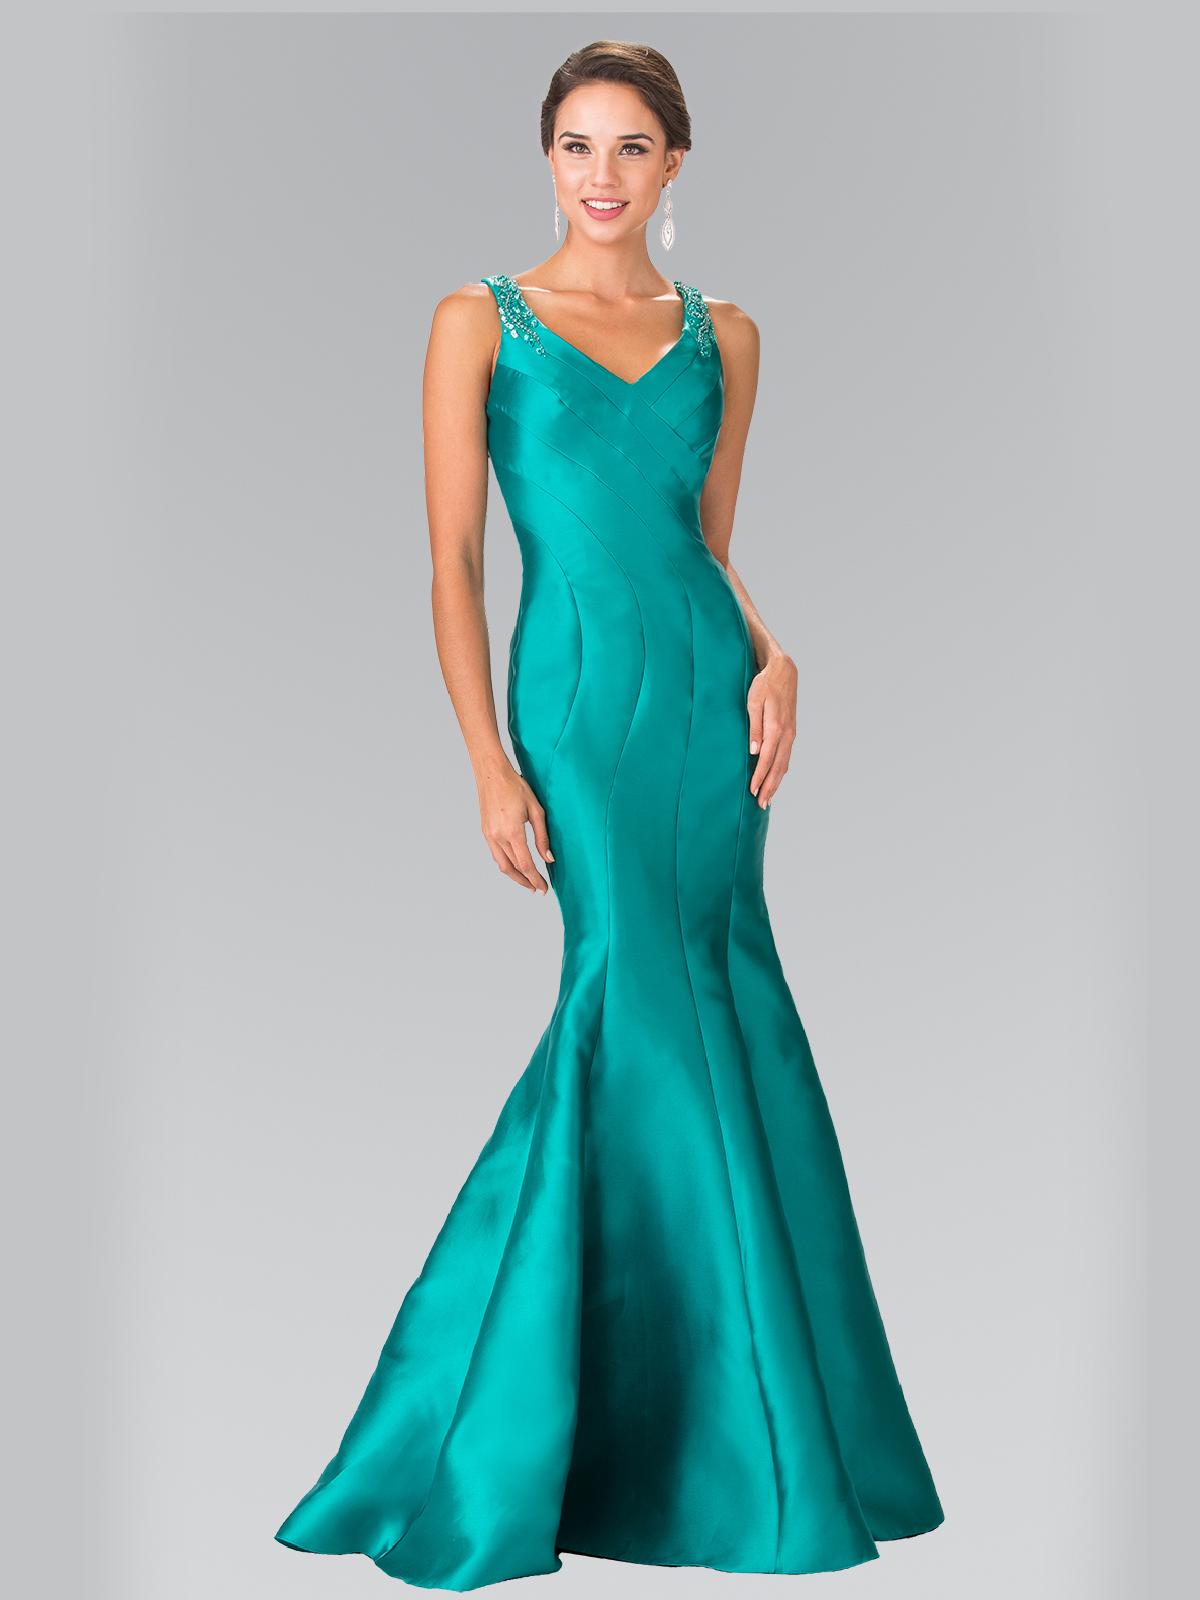 Sleeveless Long Evening Dress with Trumpet Hem | Sung Boutique L.A.